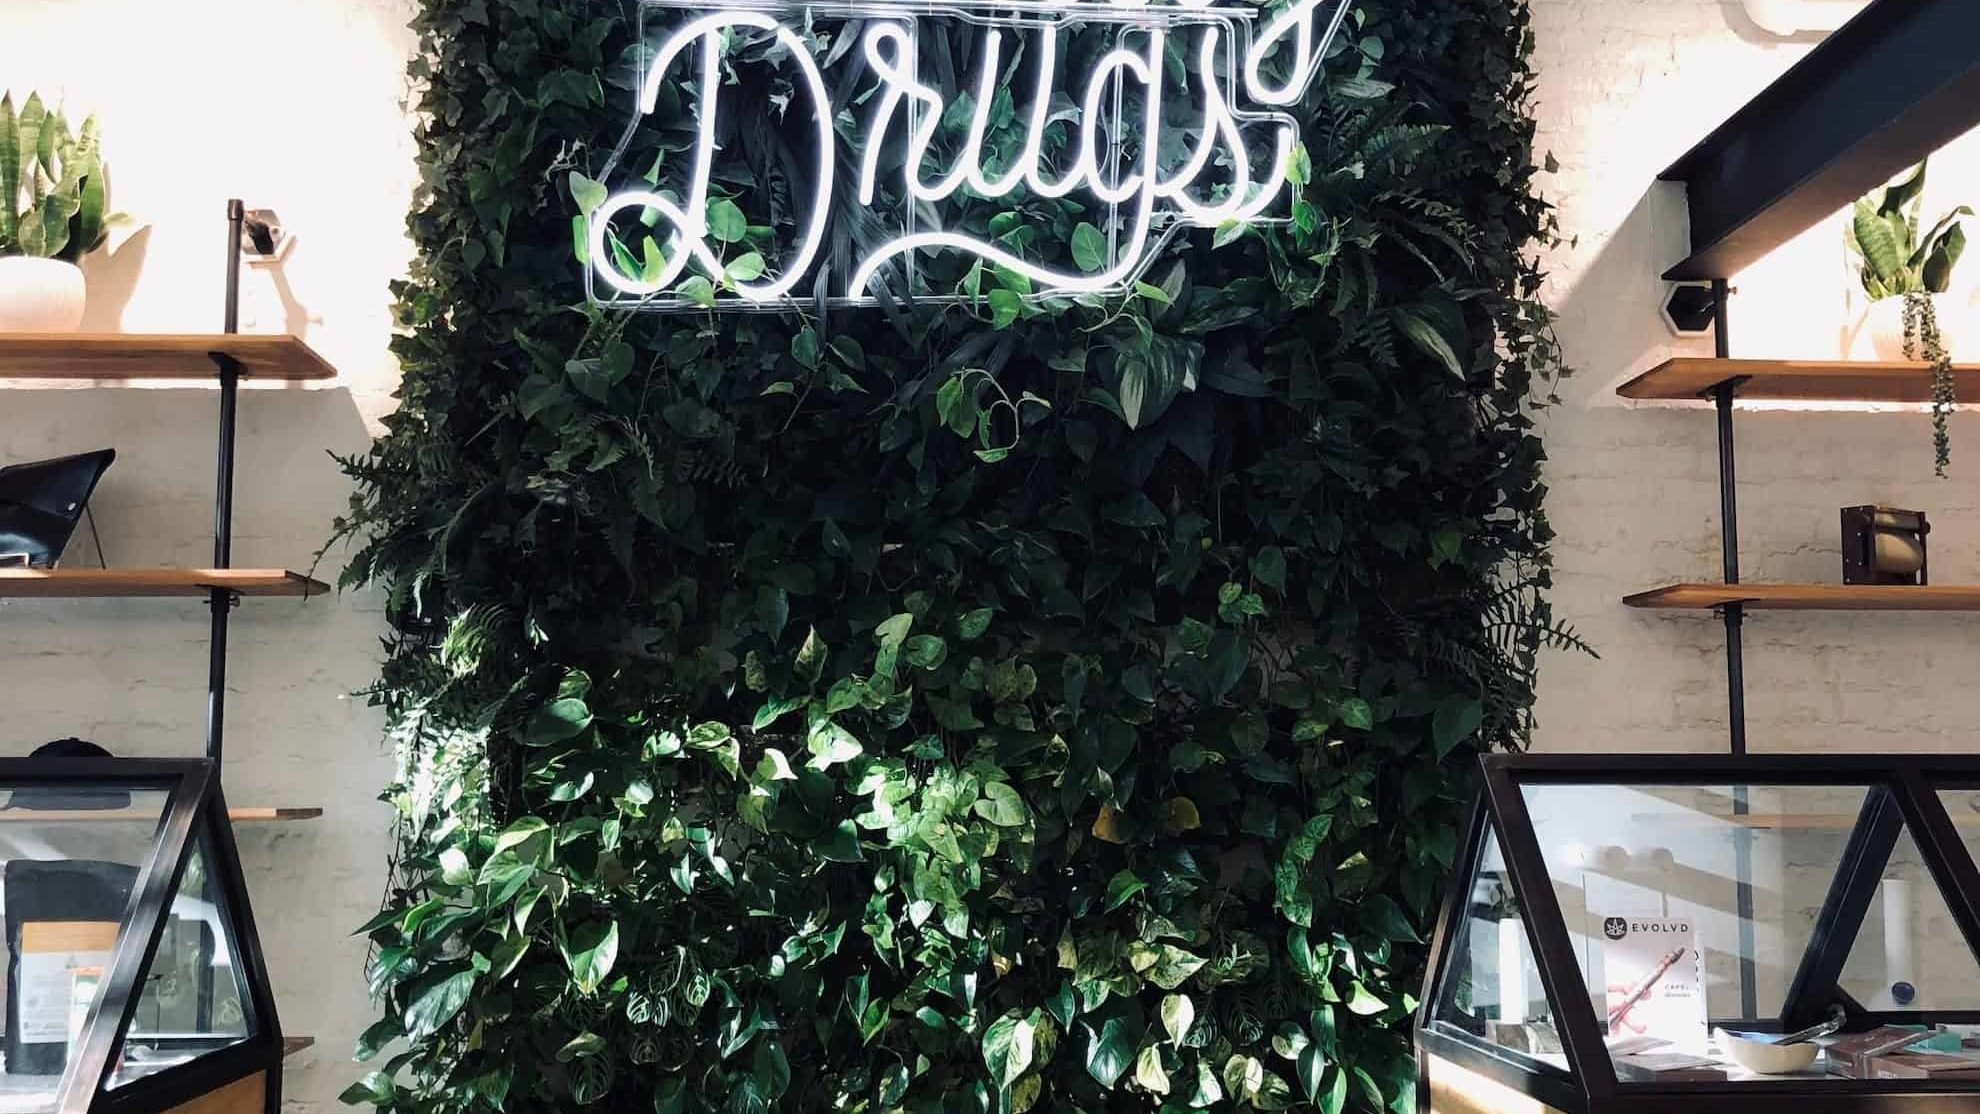 lit cannabis dispensay digital marketing agency